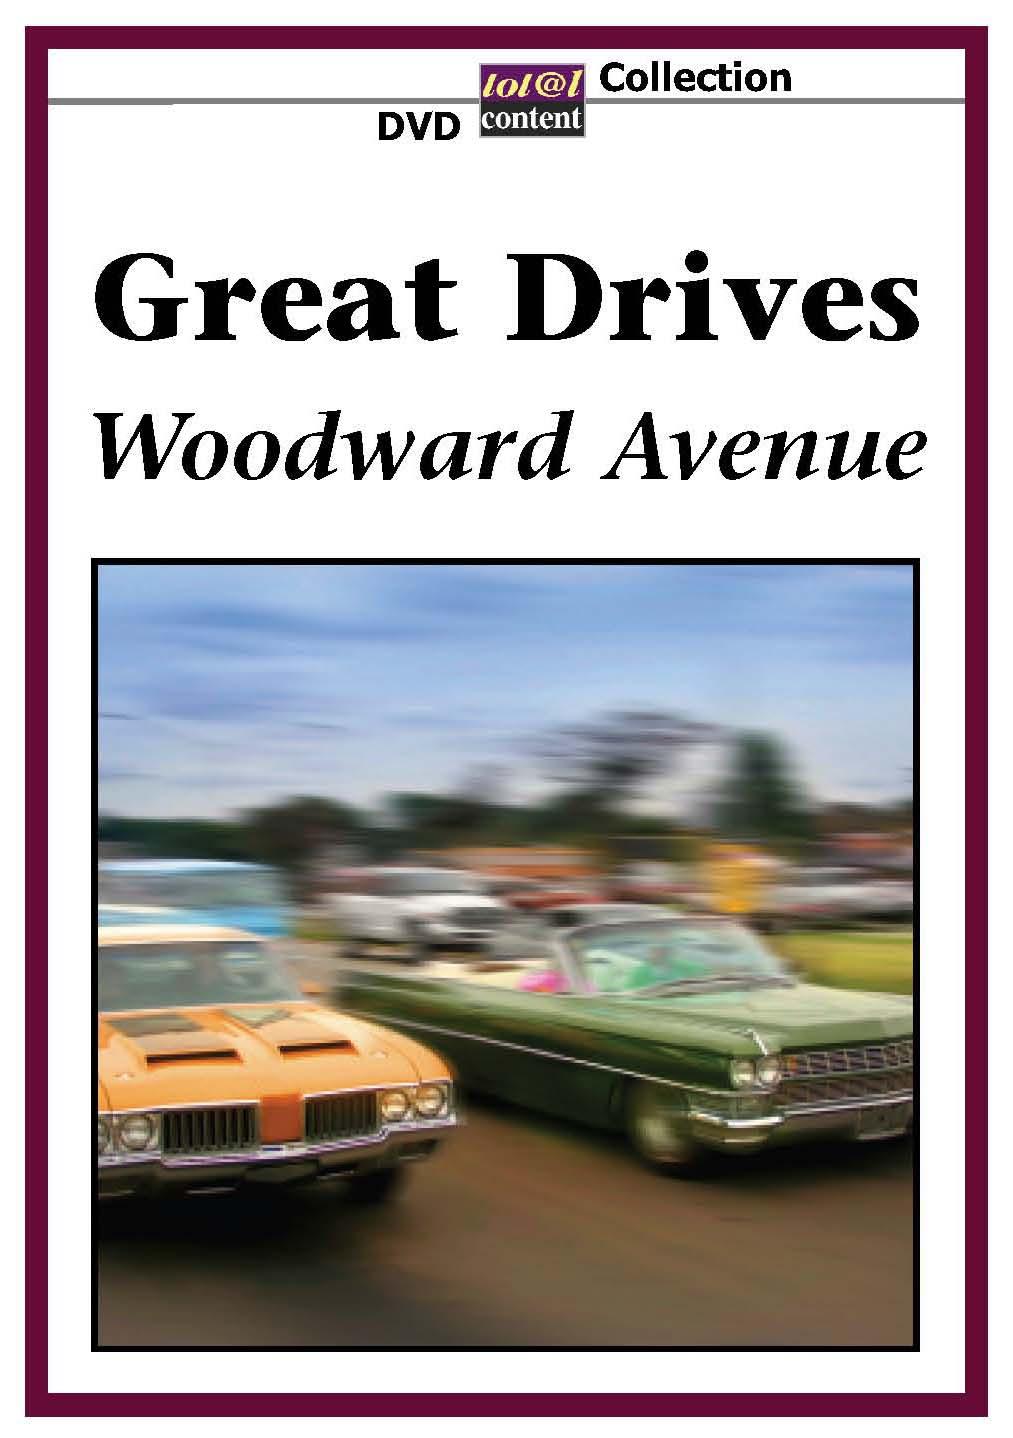 Great Drives: Woodward Avenue